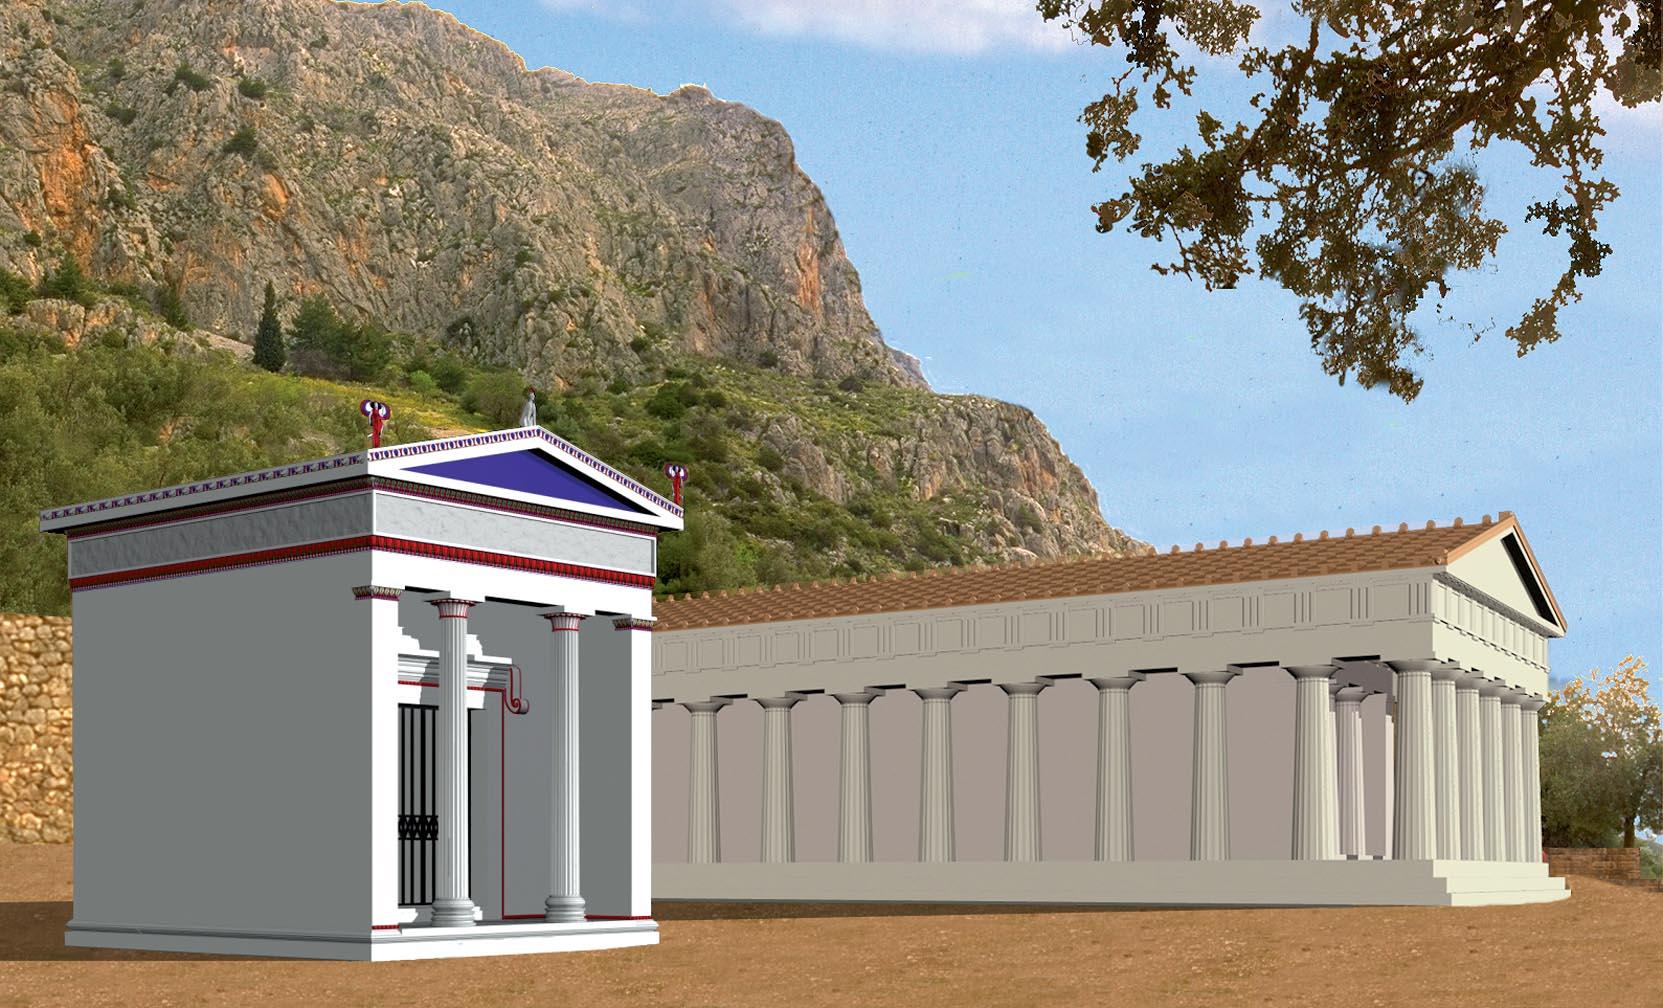 Eolian treasury and temple of Athena